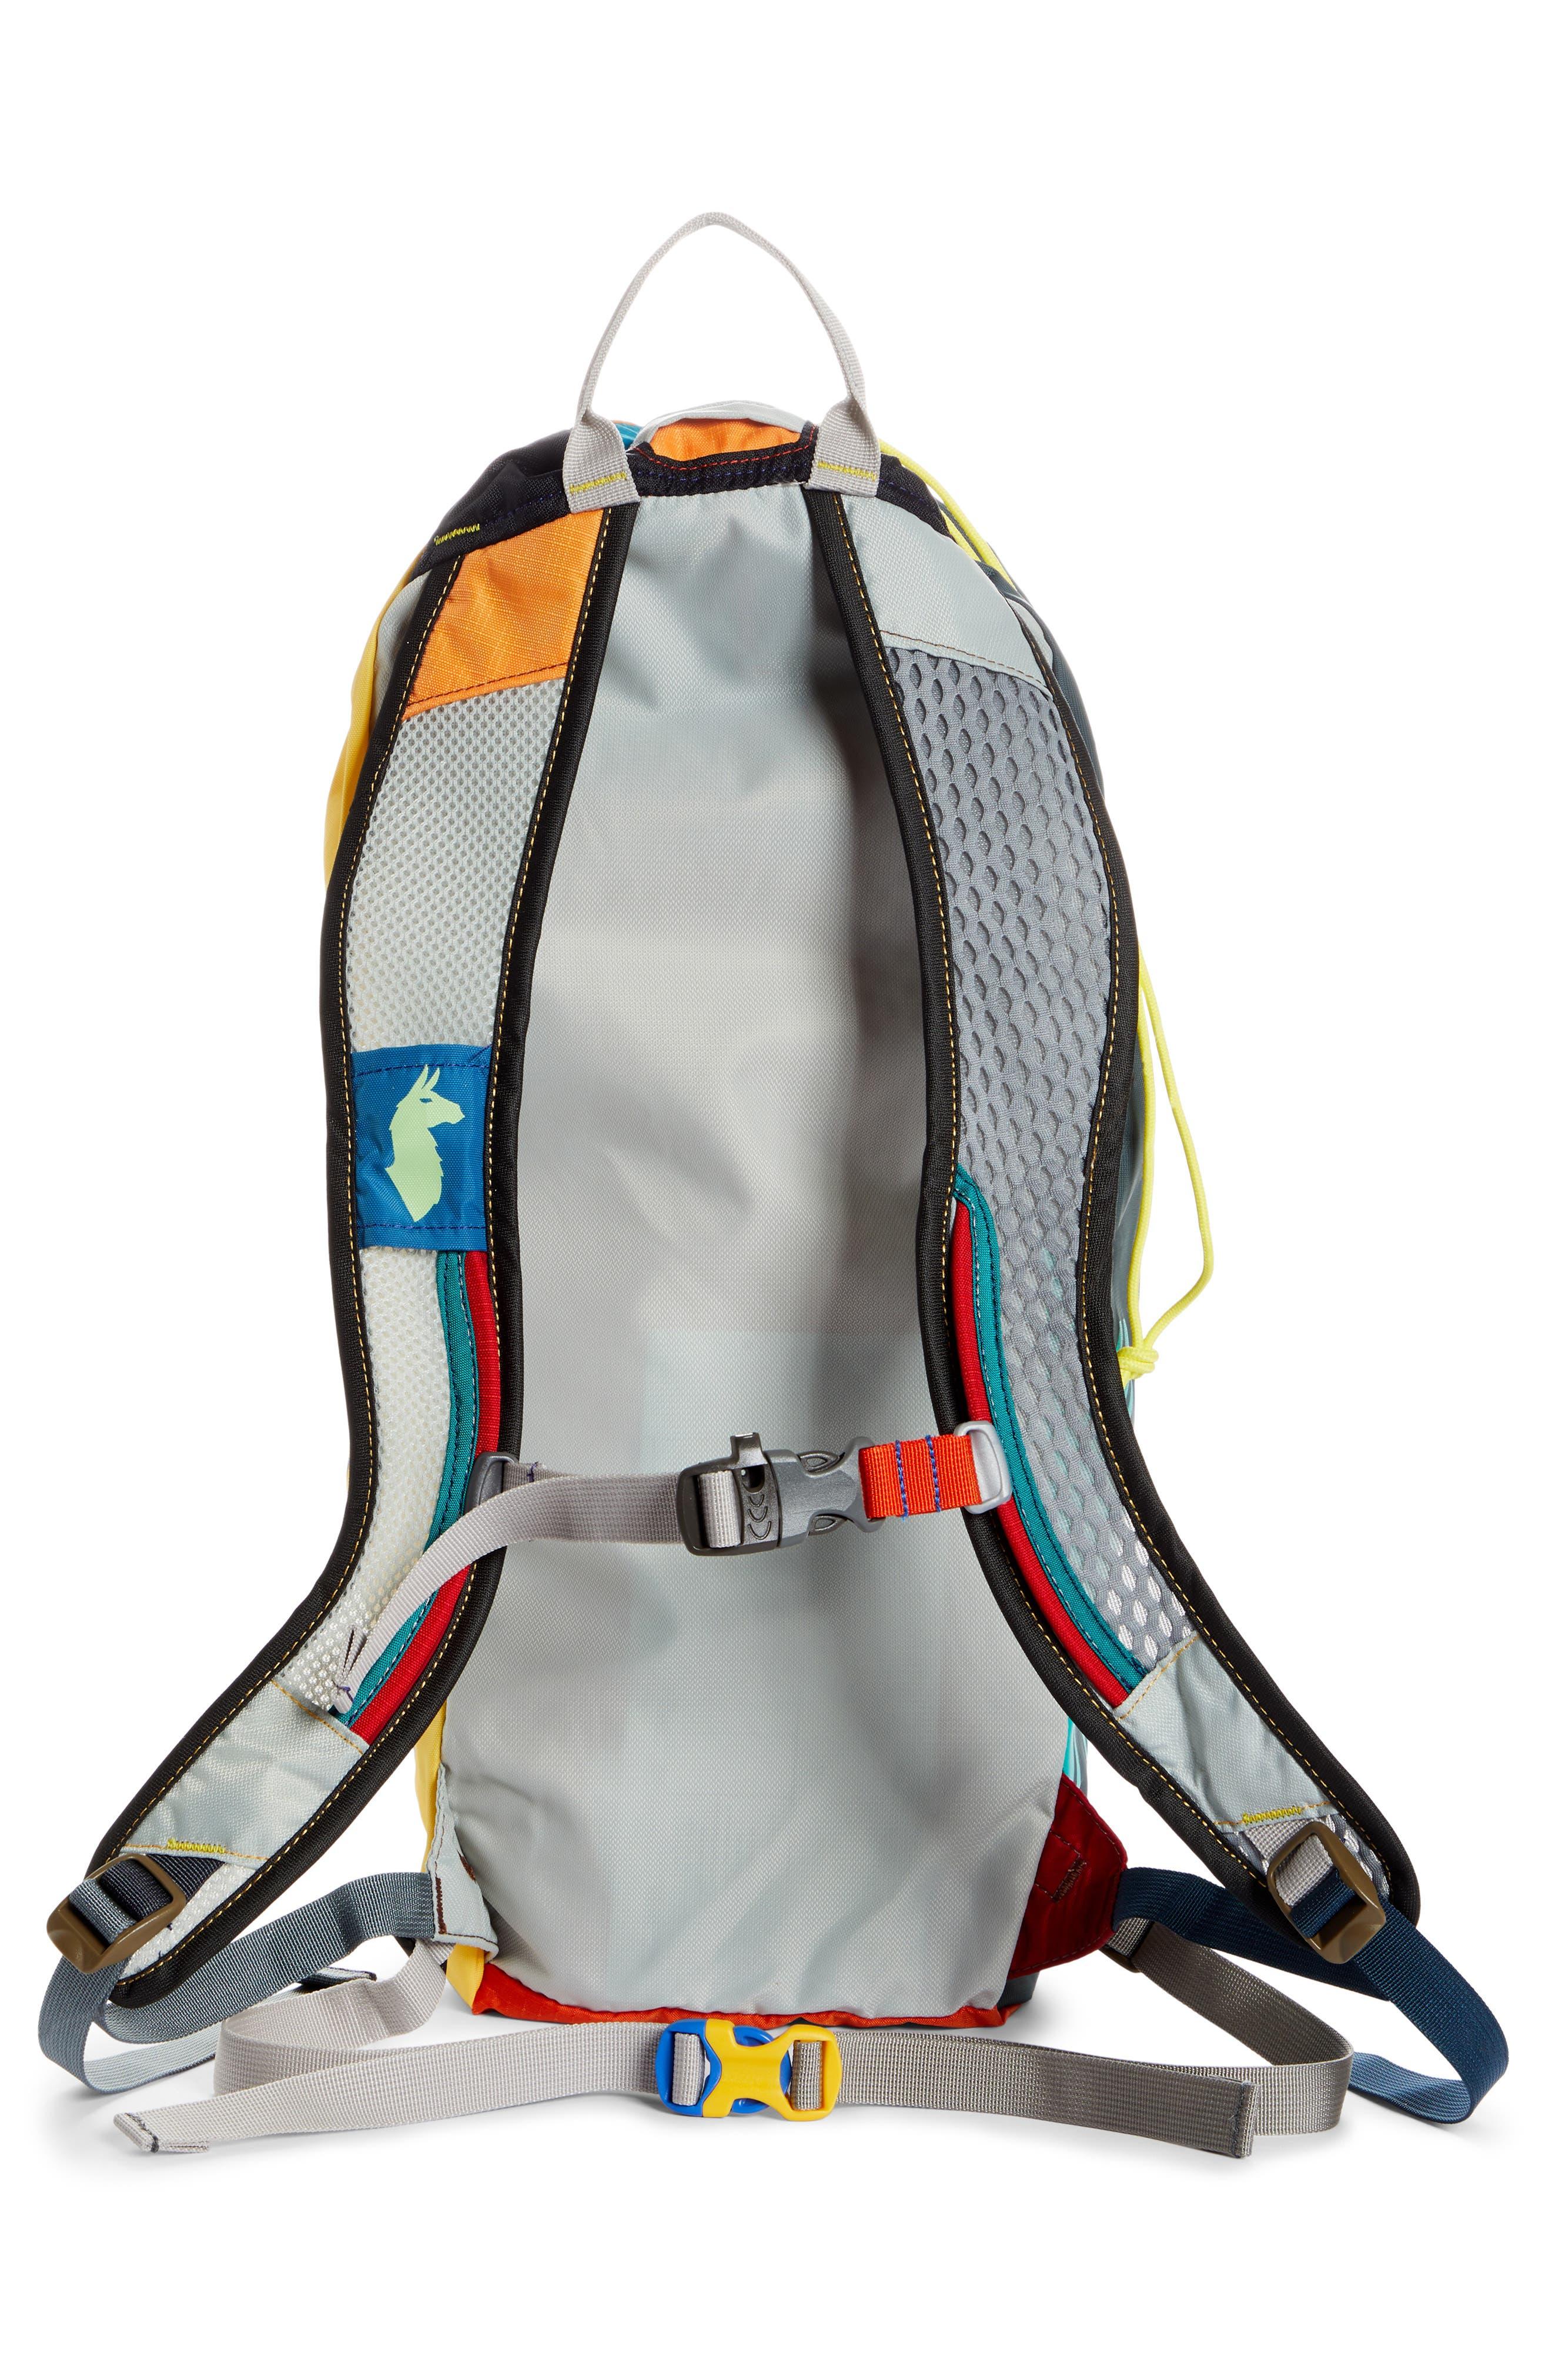 Luzon 18L Daypack,                             Alternate thumbnail 4, color,                             DEL DIA